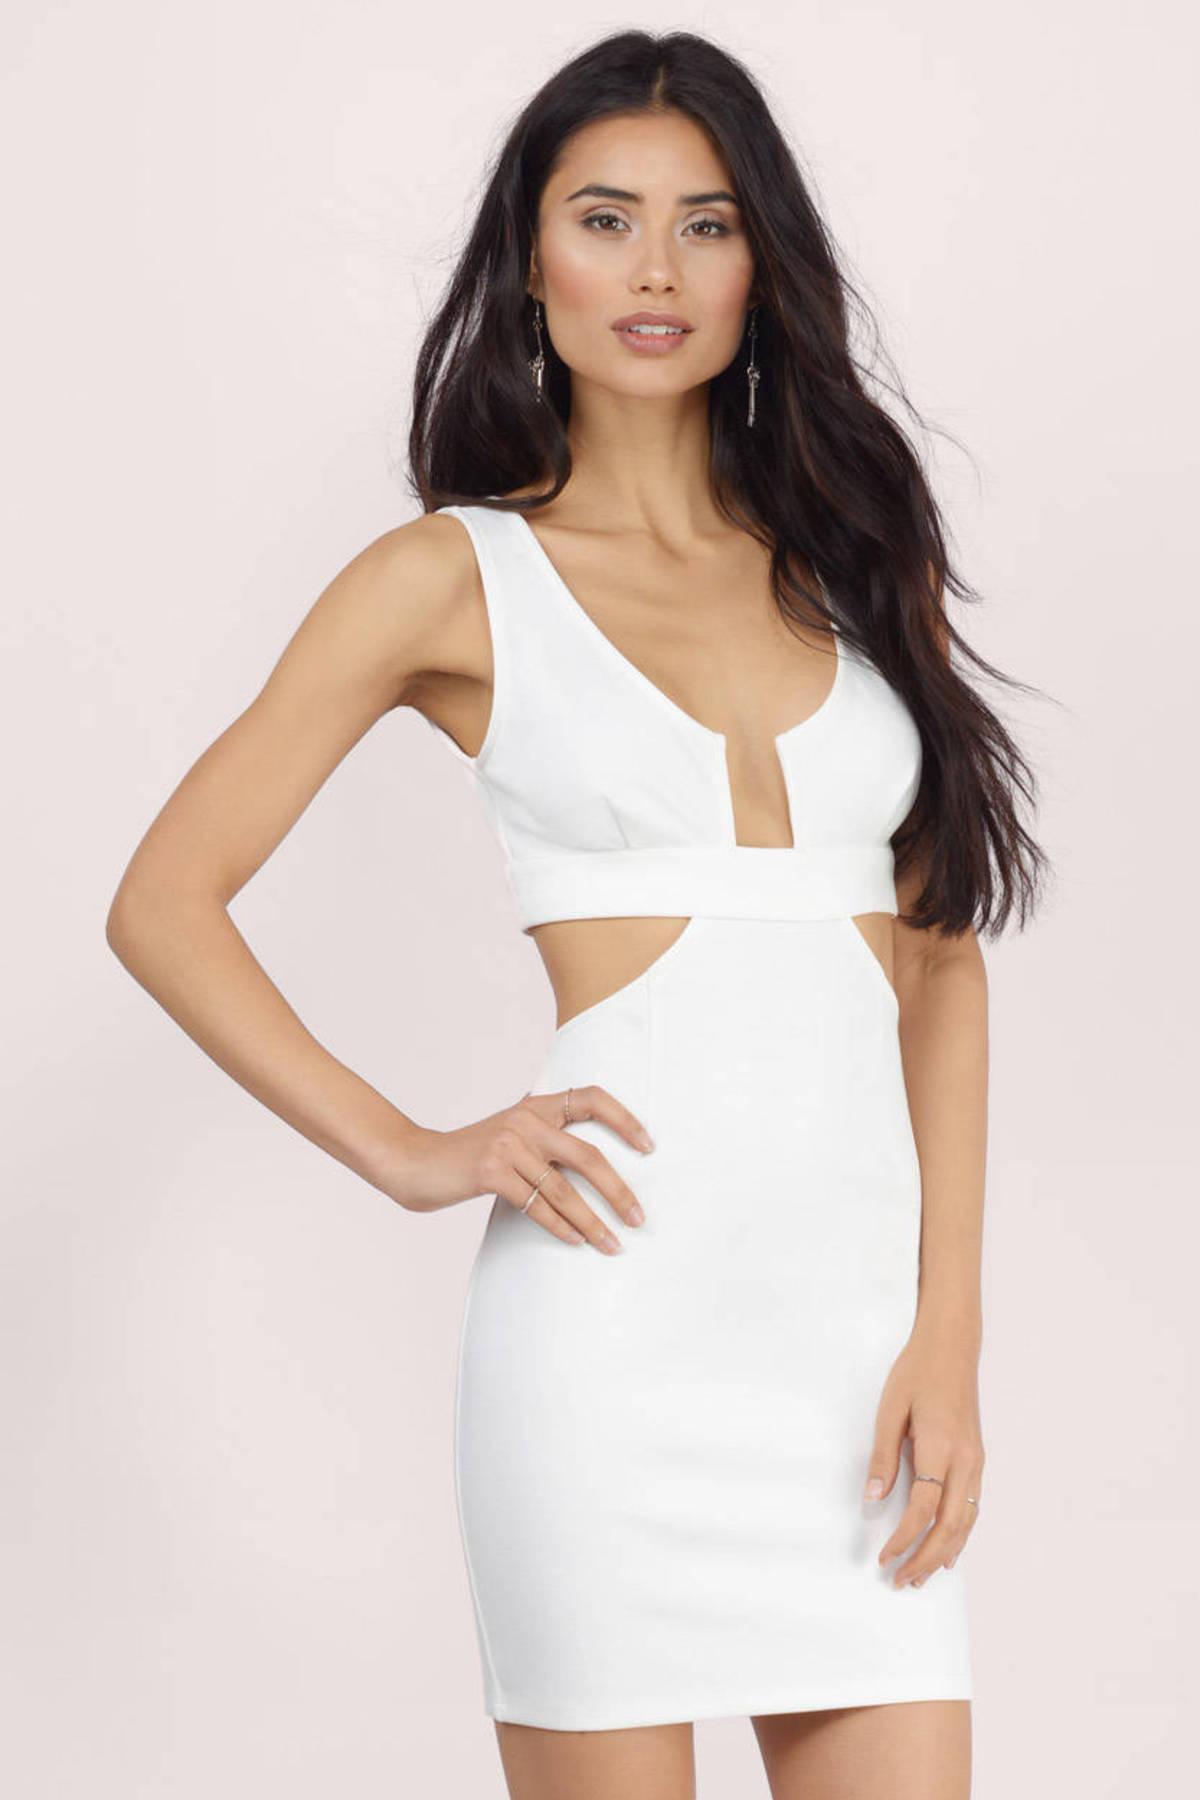 Cheap Ivory Bodycon Dress - Backless Dress - $14.00